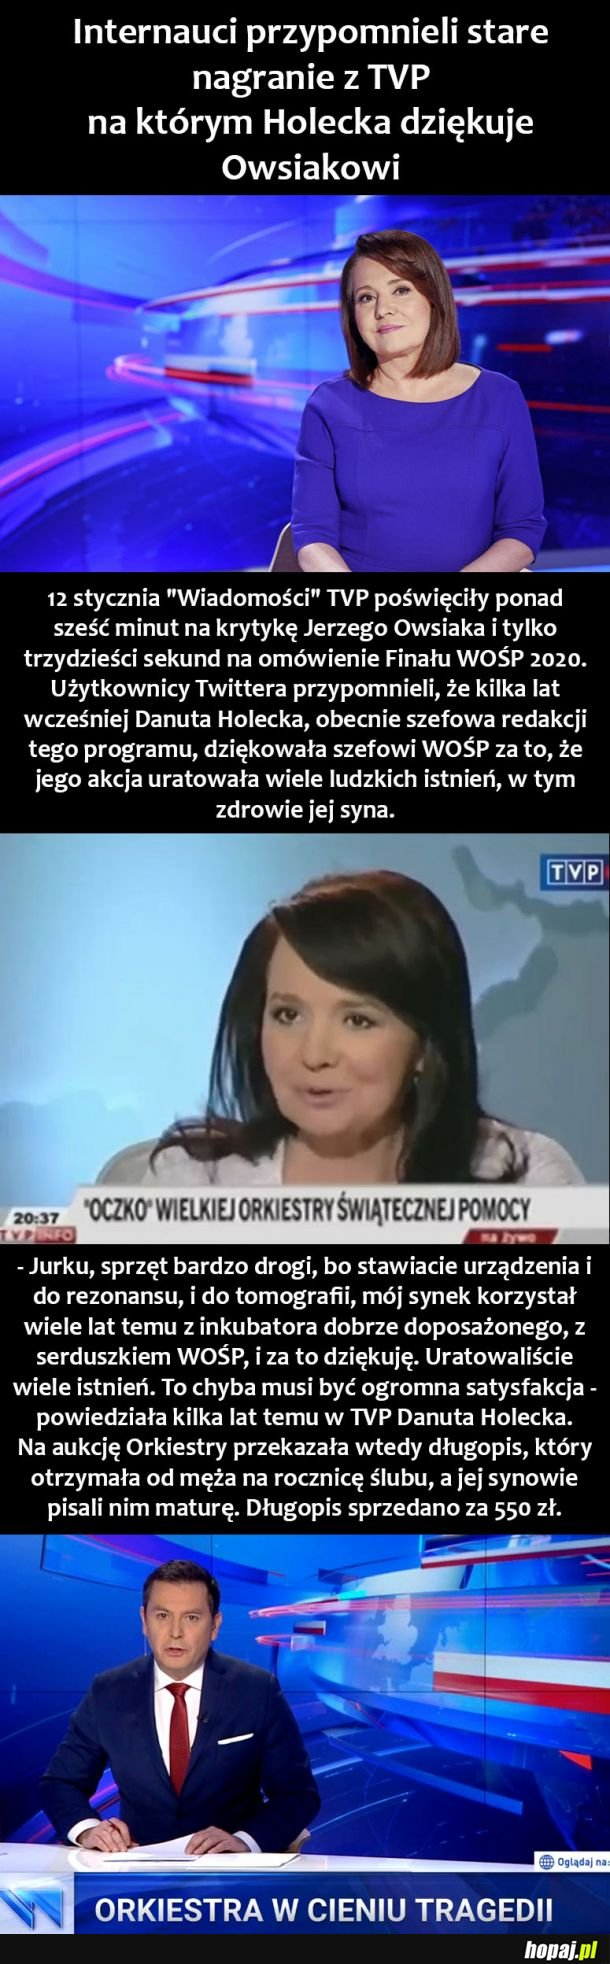 Hipokryzja TVP1